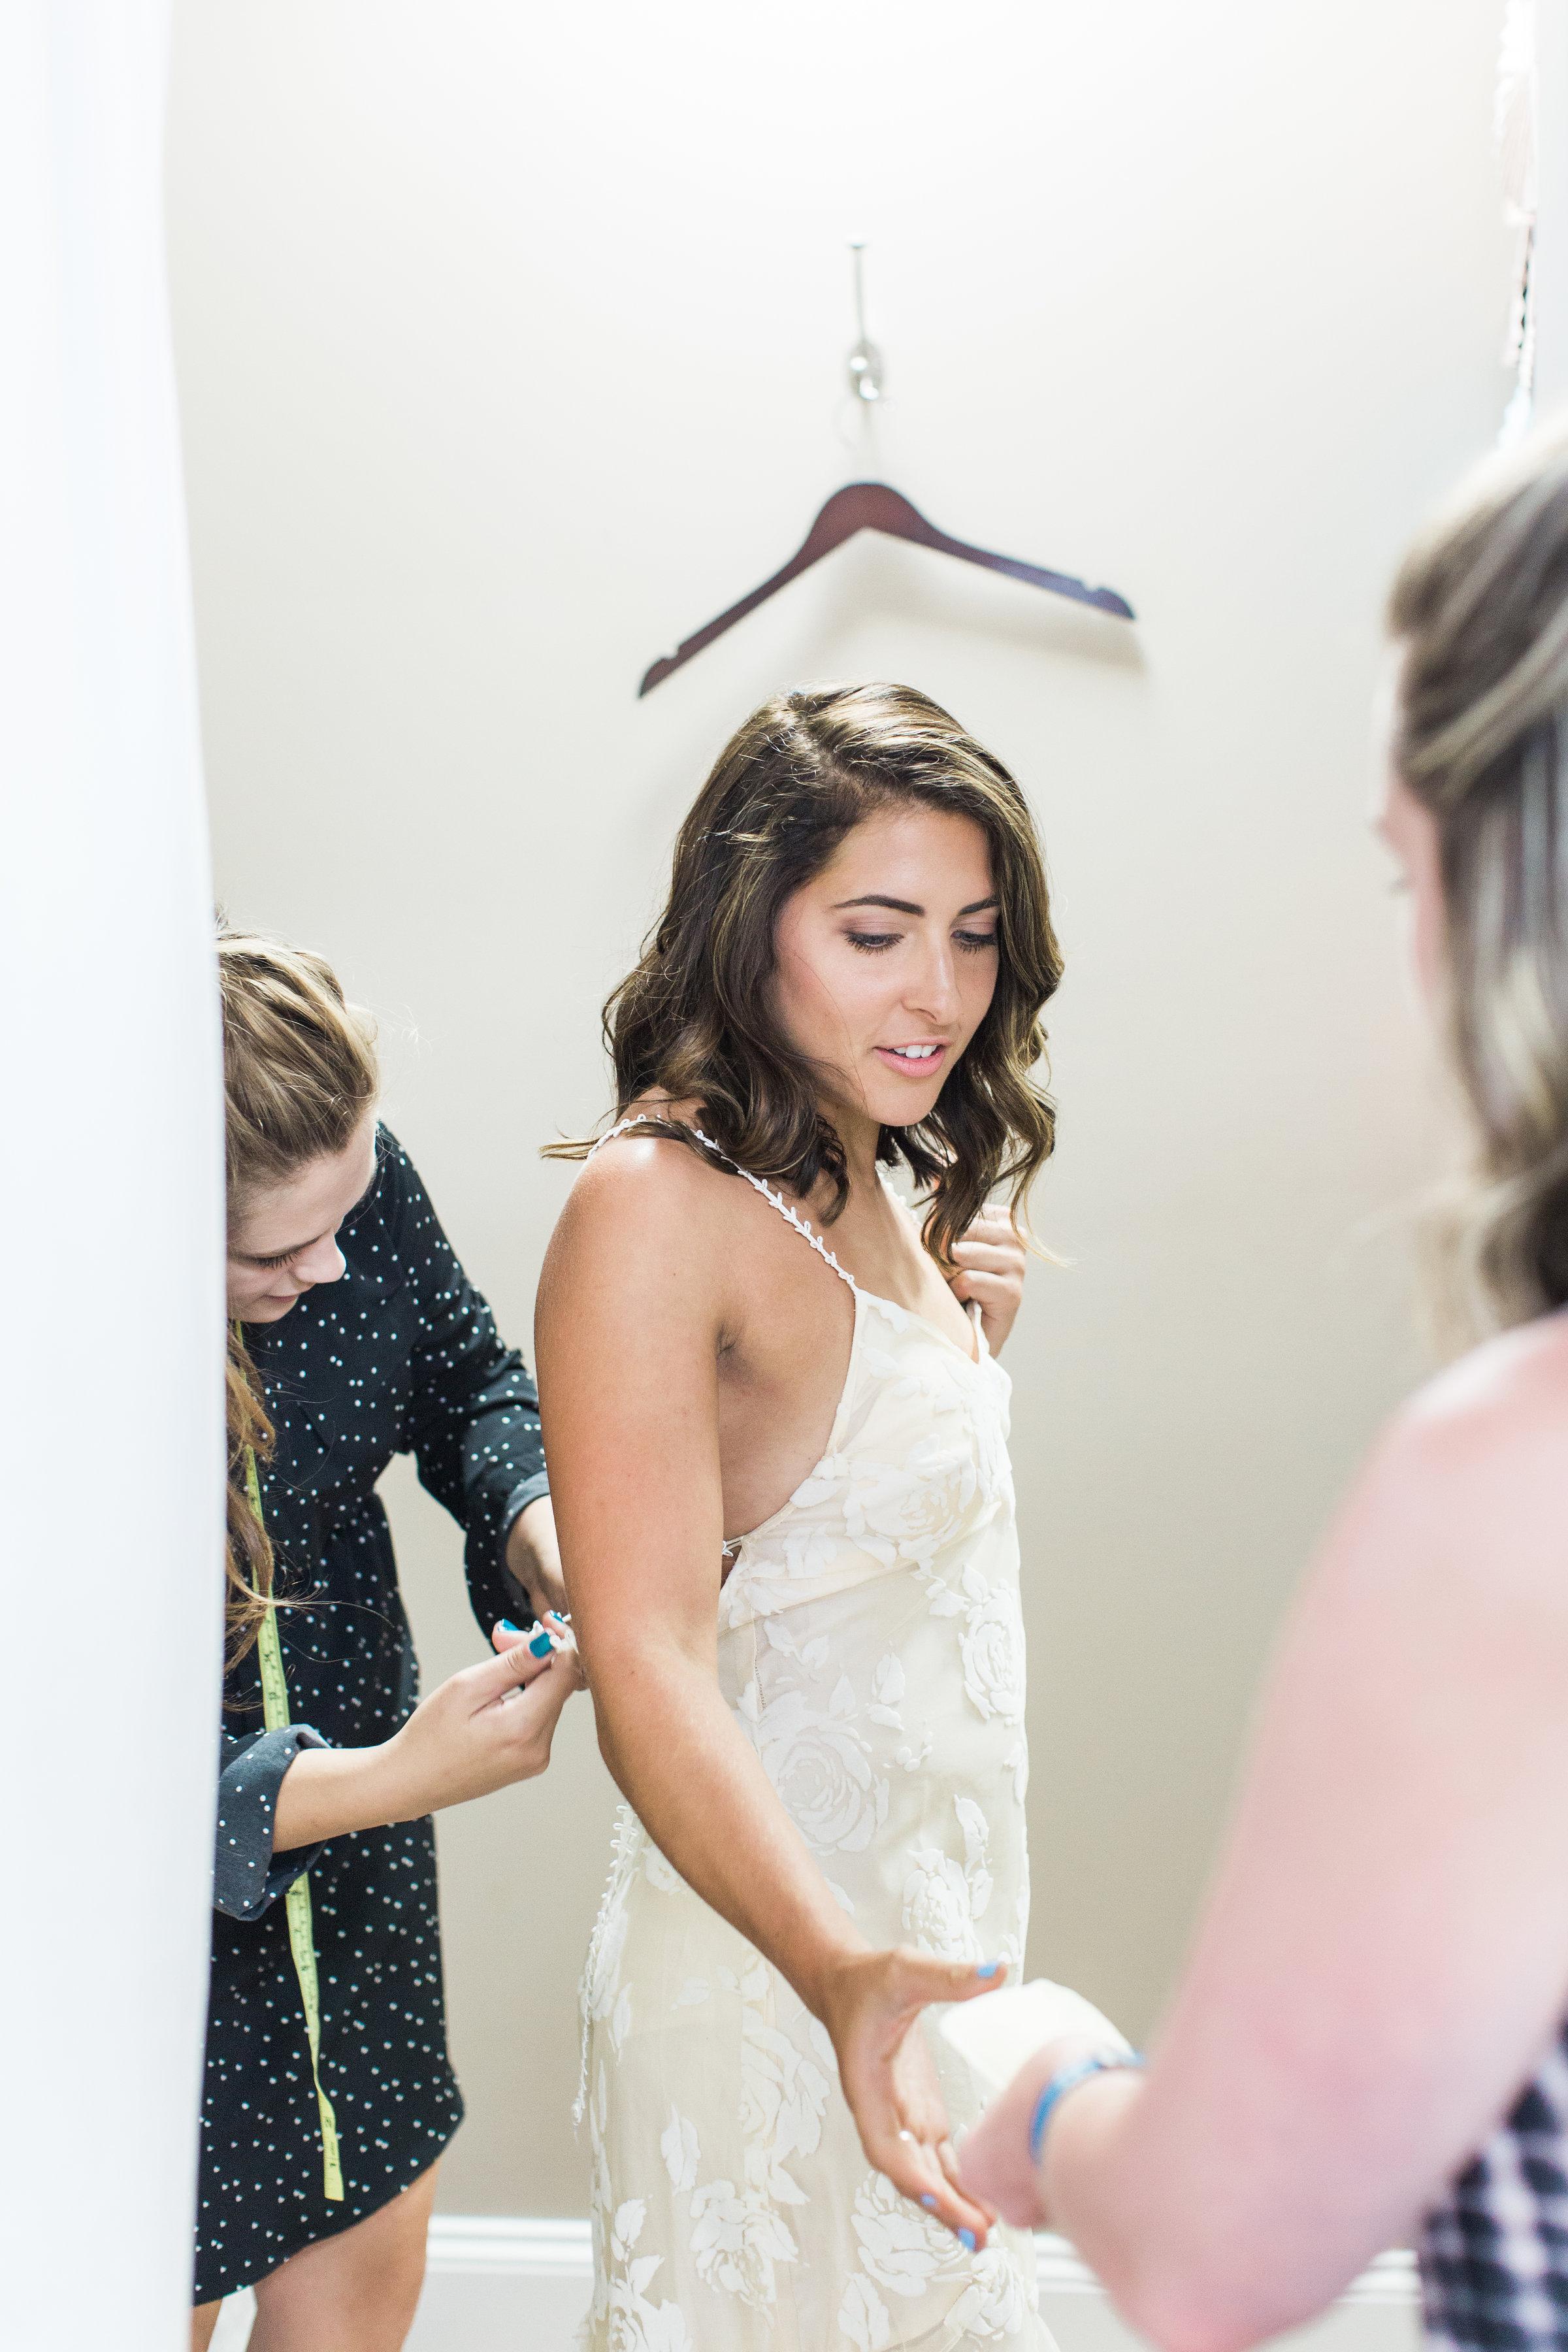 savannah-bridal-boutique-ivory-and-beau-savannah-bride-savannah-bridal-shop-wedding-dress-savannah-weddings-wedding-dress-savannah-aptbphotography-aptbphoto-veils-tiaras-bridal-jewelery-bridesmaids-dresses-bridesmaids-gowns-savannah-bridesmaids.jpg-21.jpg